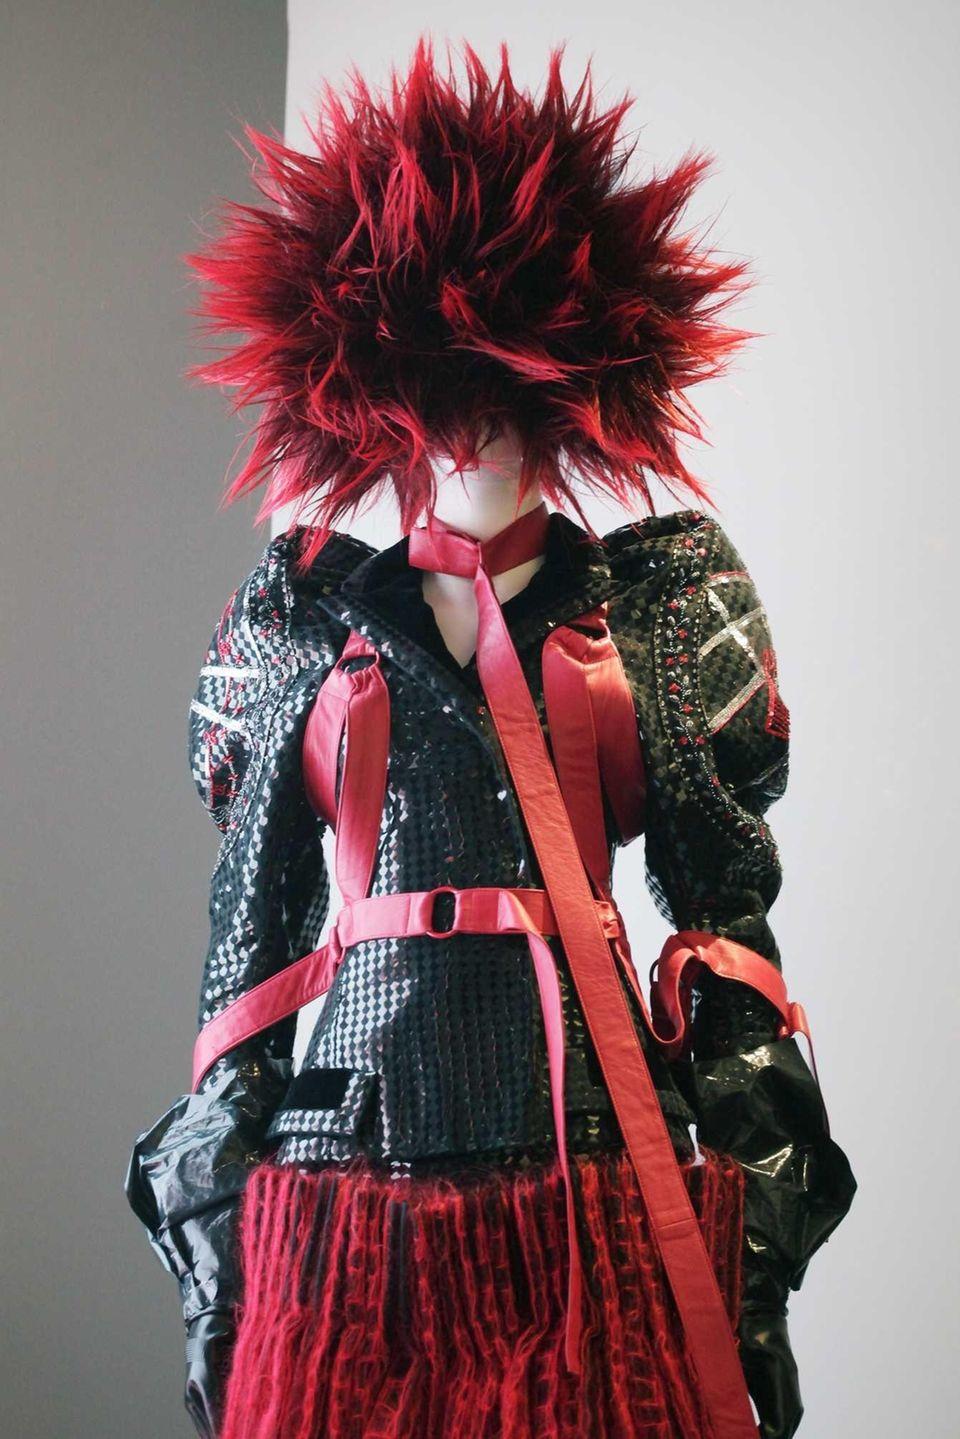 A late 1970's ensemble of fashion by Vivienne